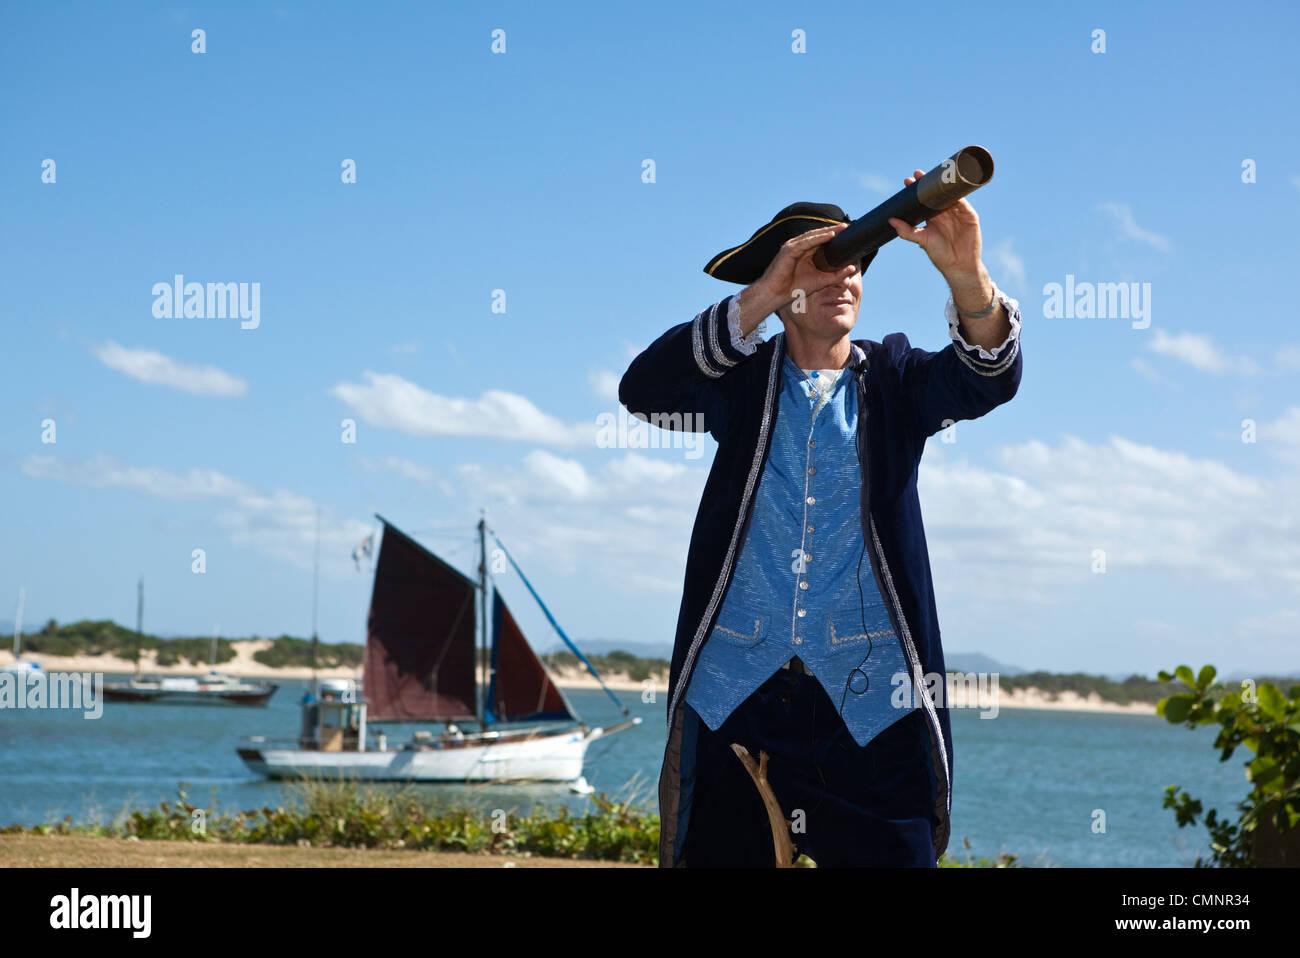 Re-enactment of Captain Cook's landing at Cooktown, Queensland, Australia - Stock Image